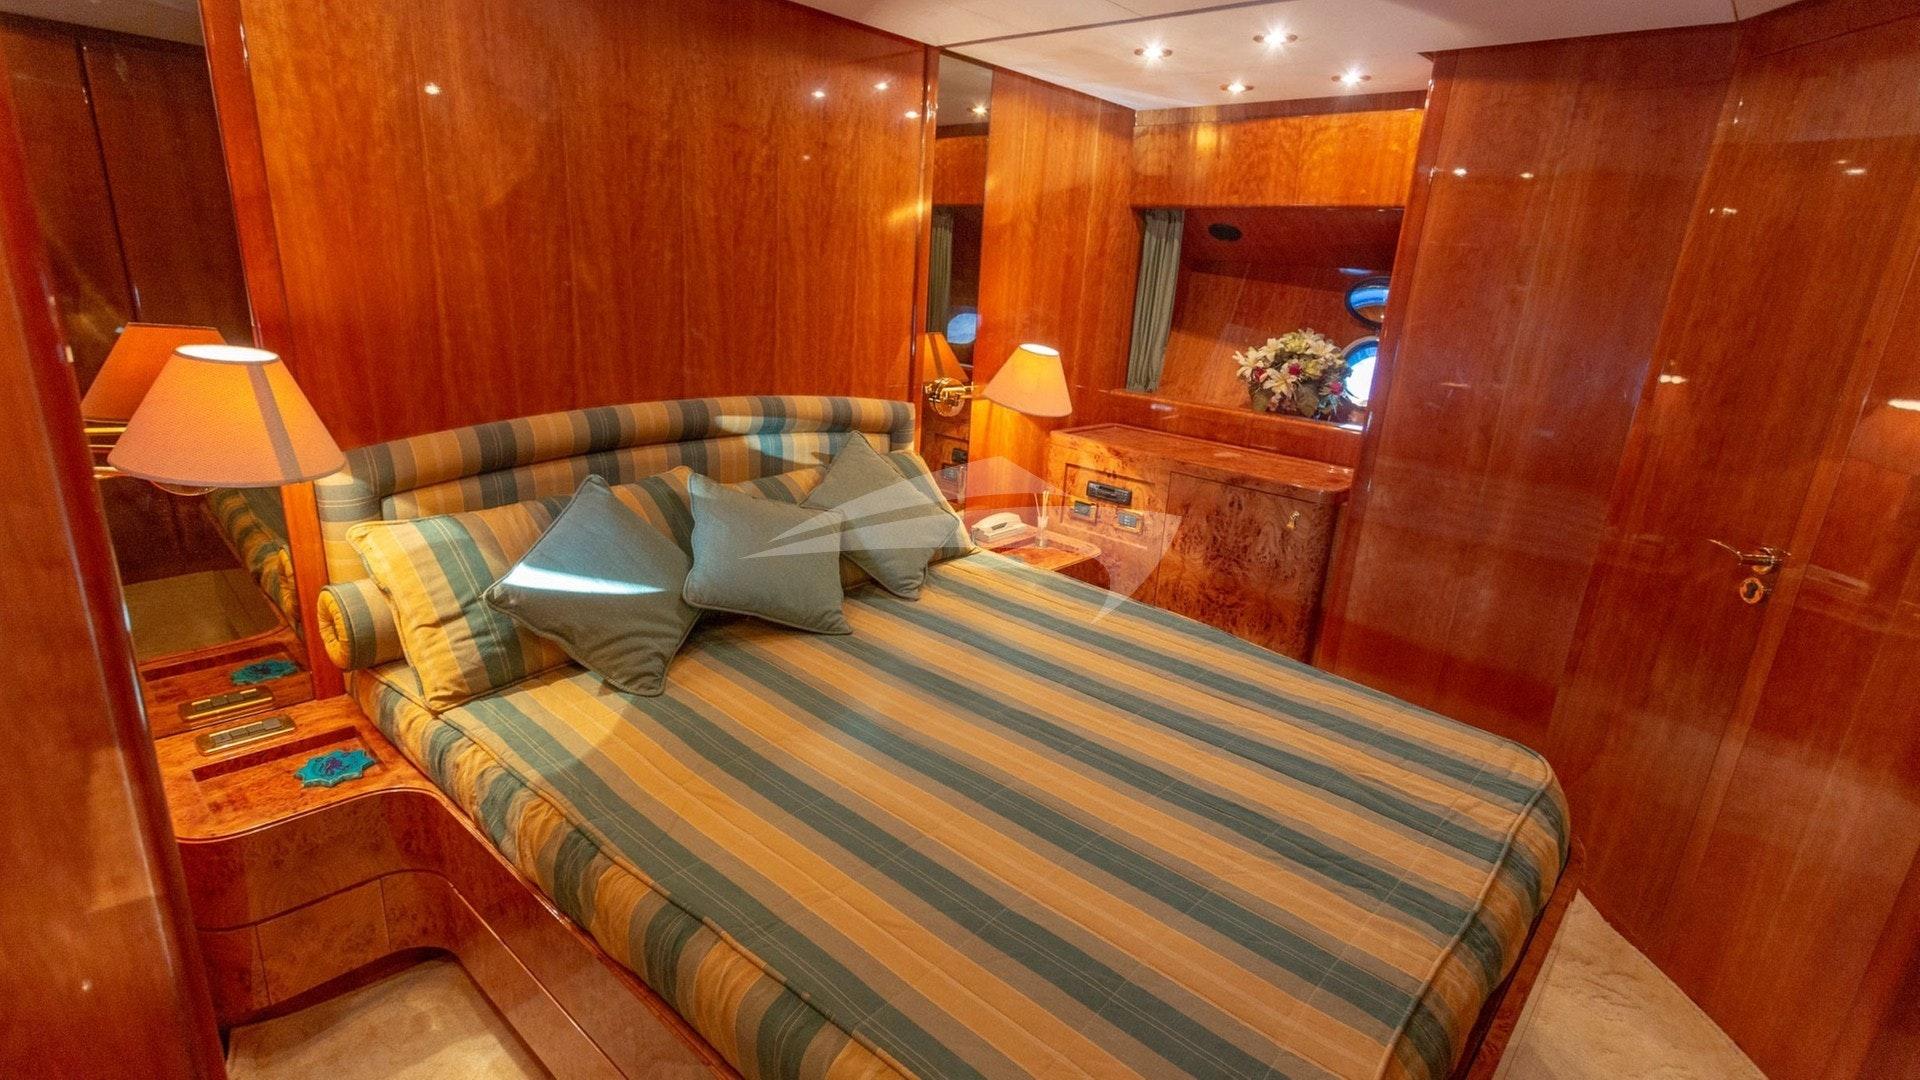 BarbarossaMoratti-SanLorenzo-72-VIP Cabin-02